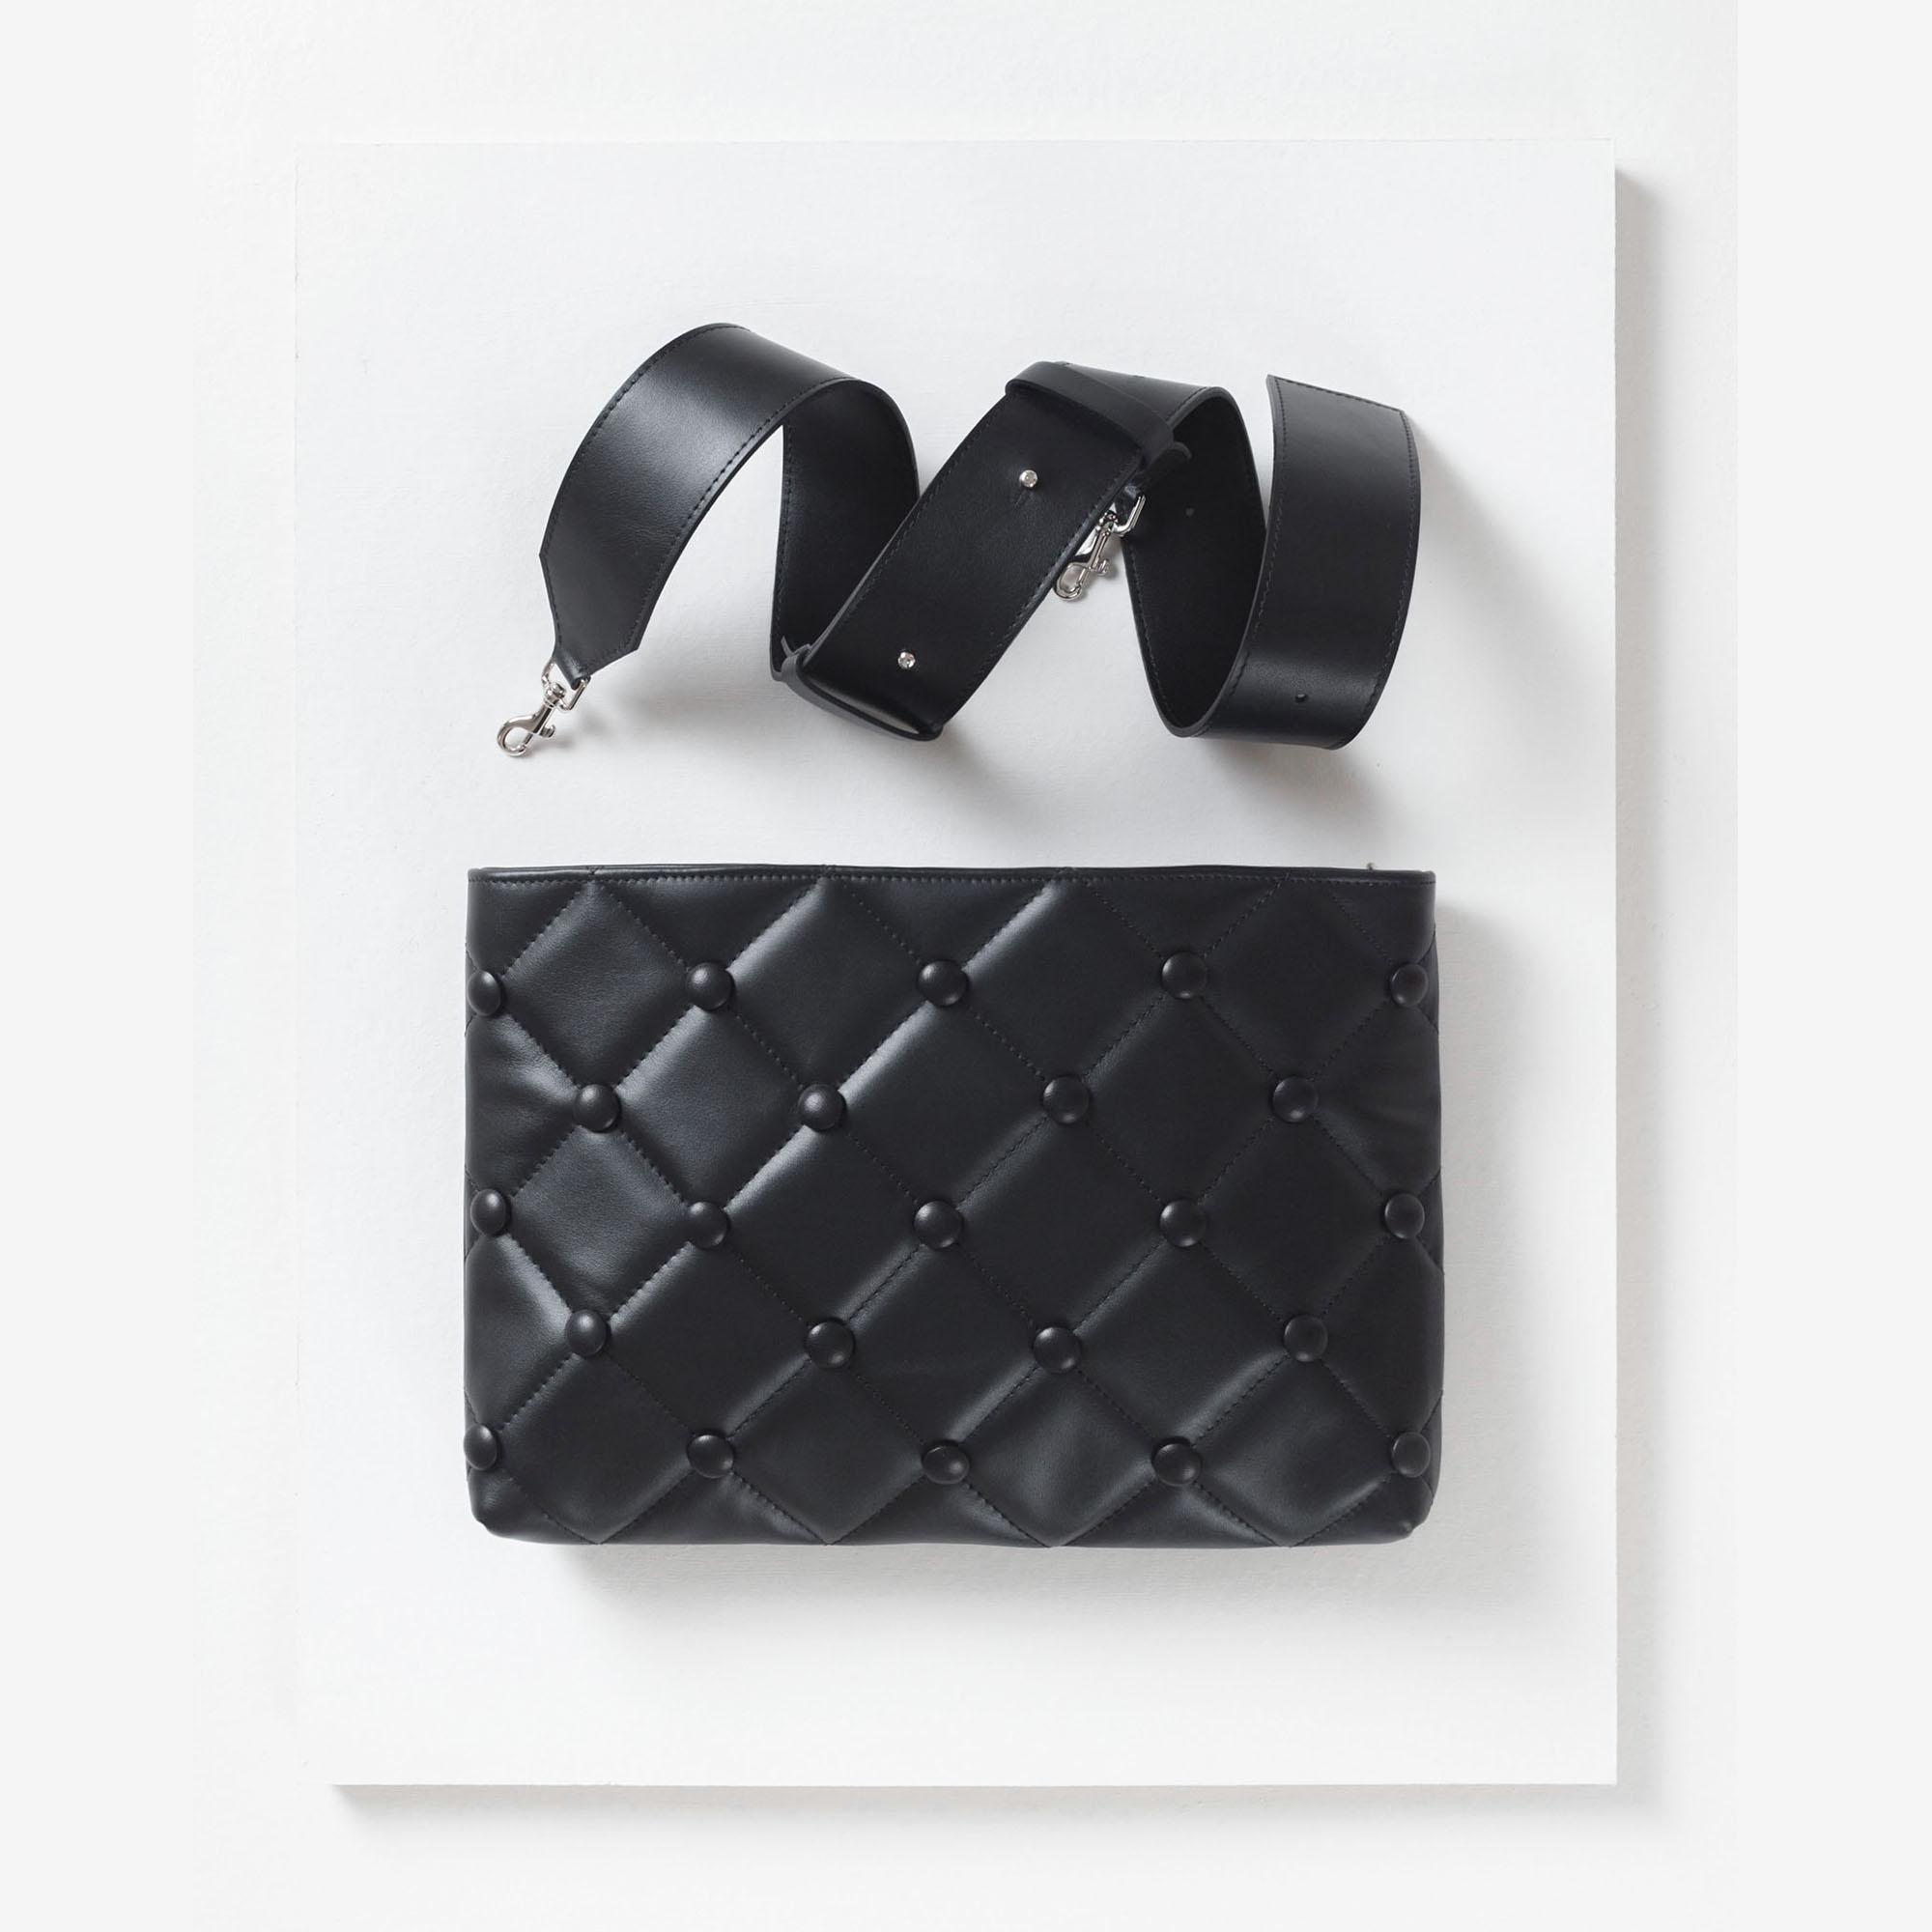 Laimushka black leather quilted handbag with shoulder strap